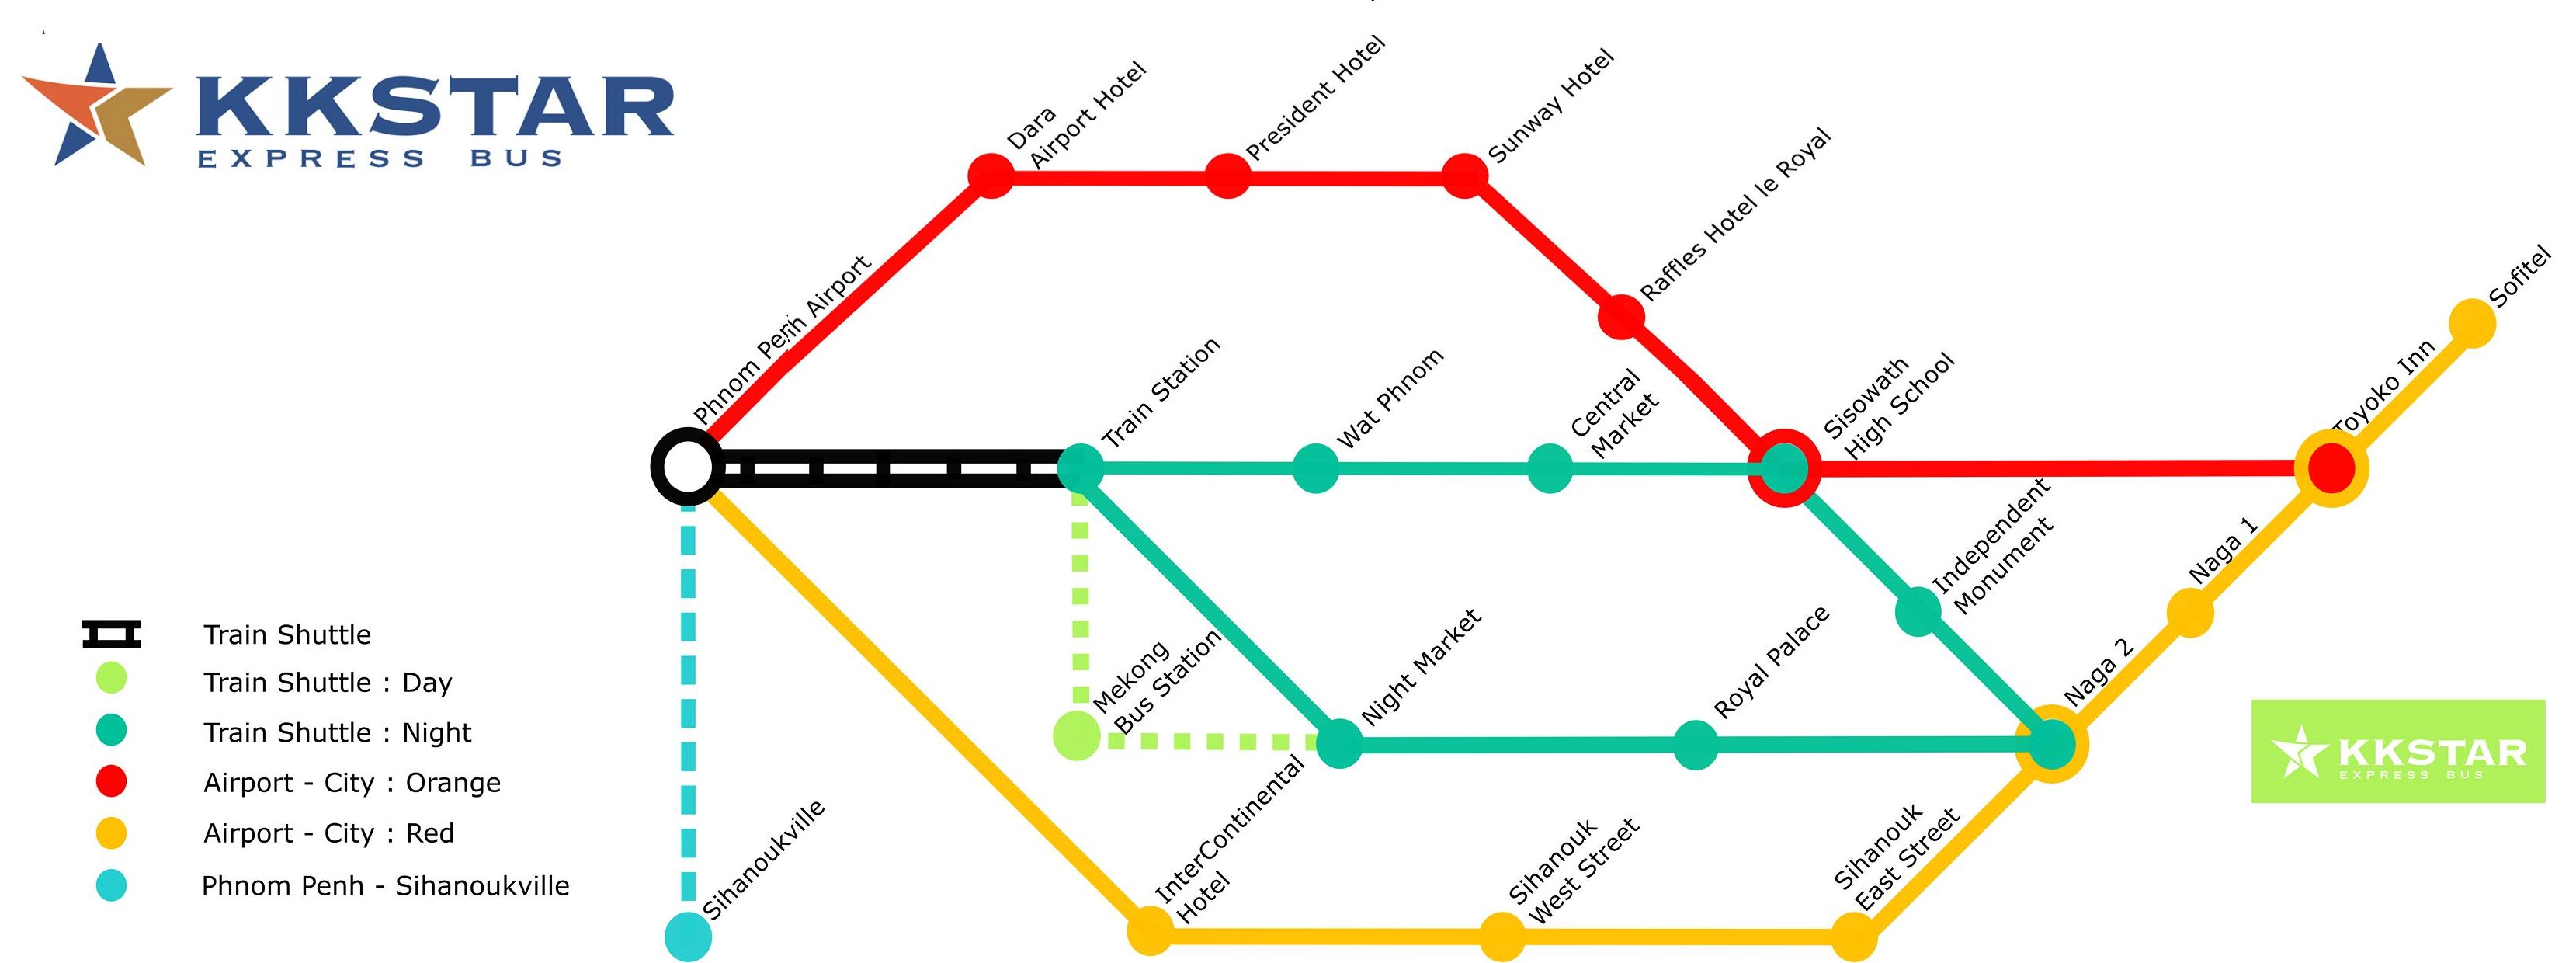 KKSTAR Express Bus Routes